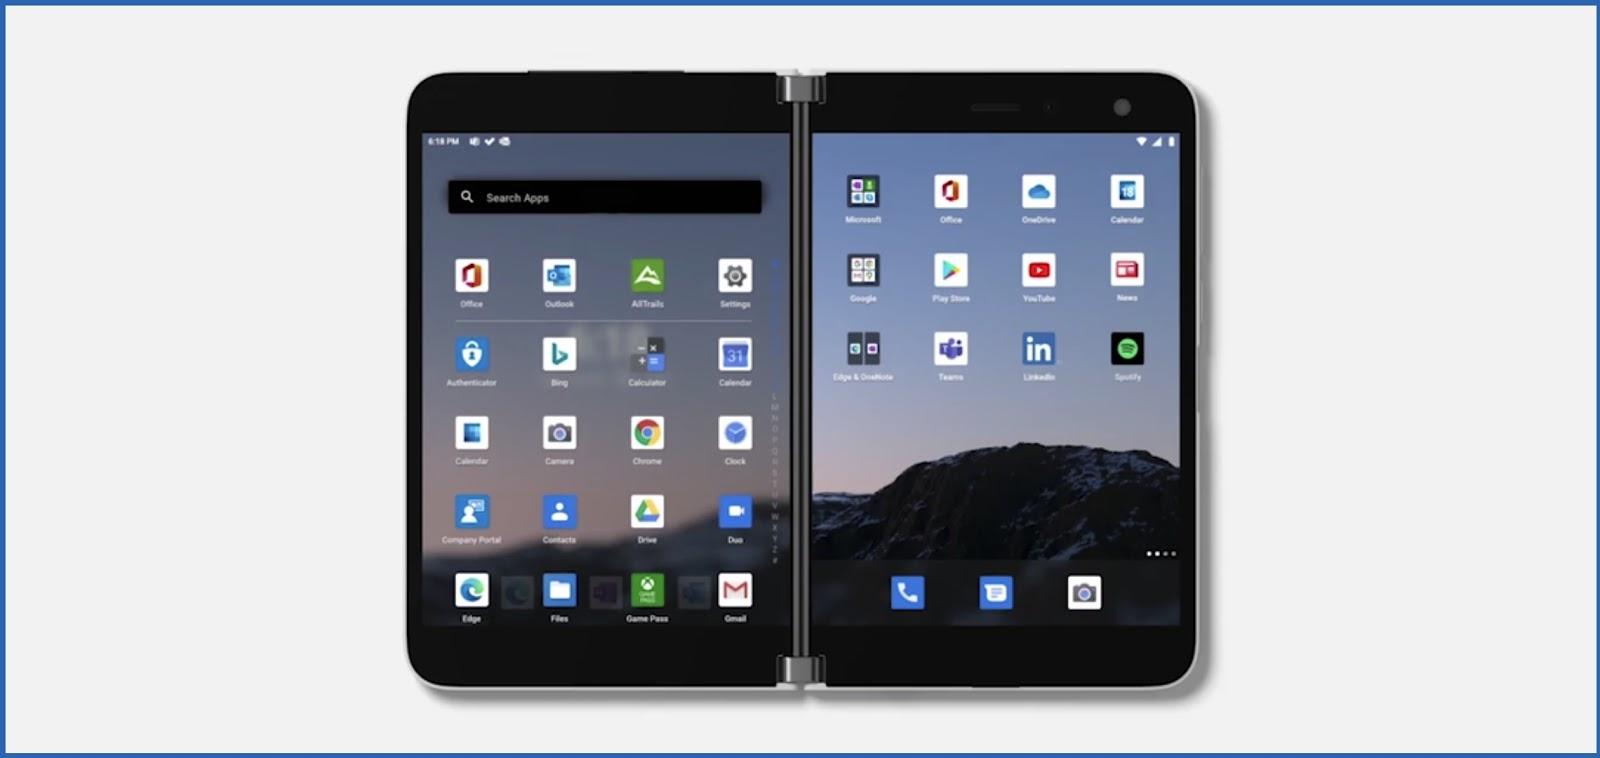 Surface Duo แอนดรอยด์ตัวแรกจาก Microsoft เพื่ออนาคตของแอนดรอยด์